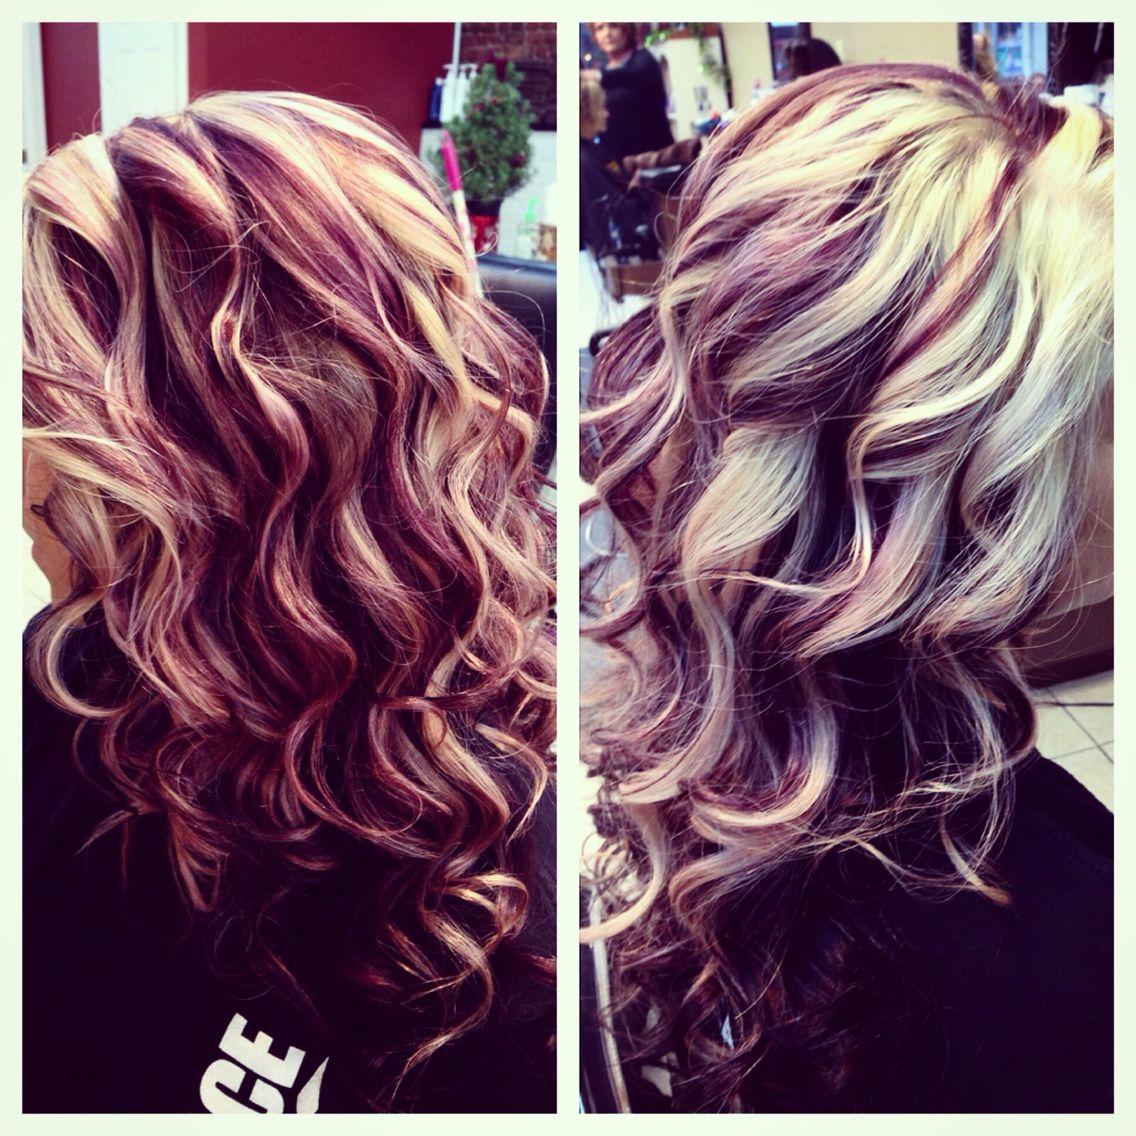 Blonde Purple Dark Brown With Red Love It Red Blonde Hair Hair Styles Red Hair With Blonde Highlights